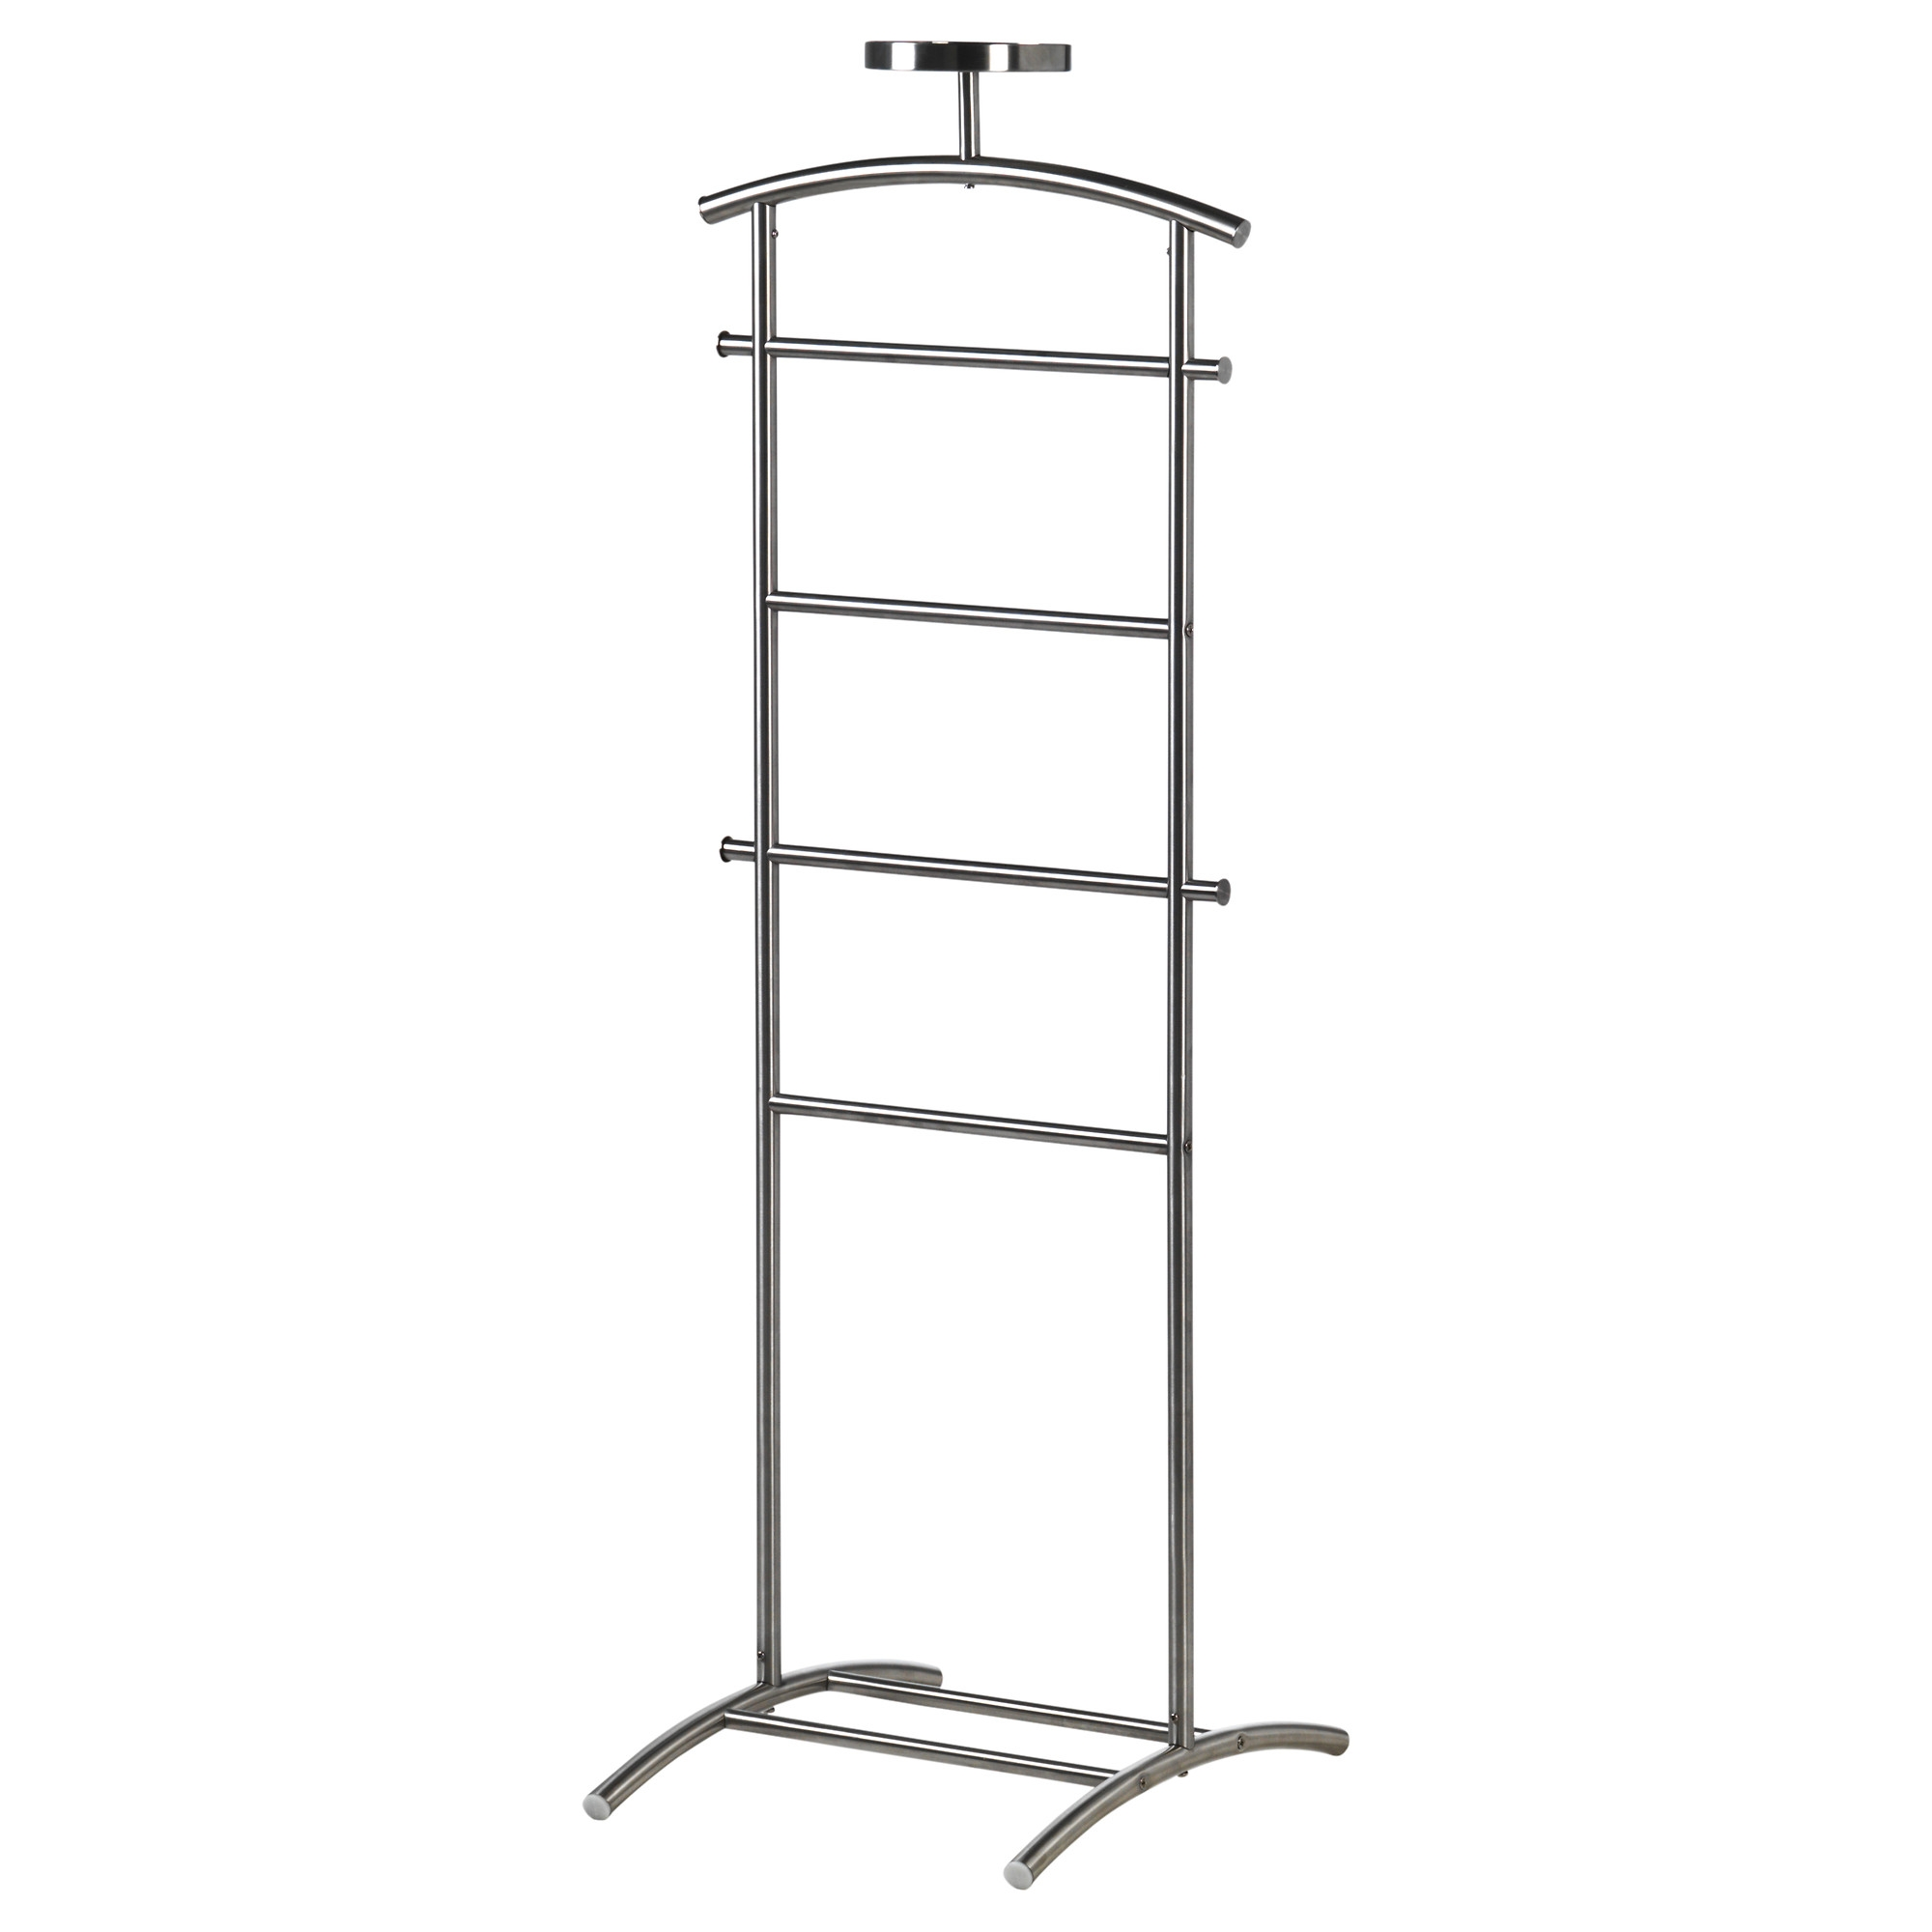 Ikea iluminacion grundtal